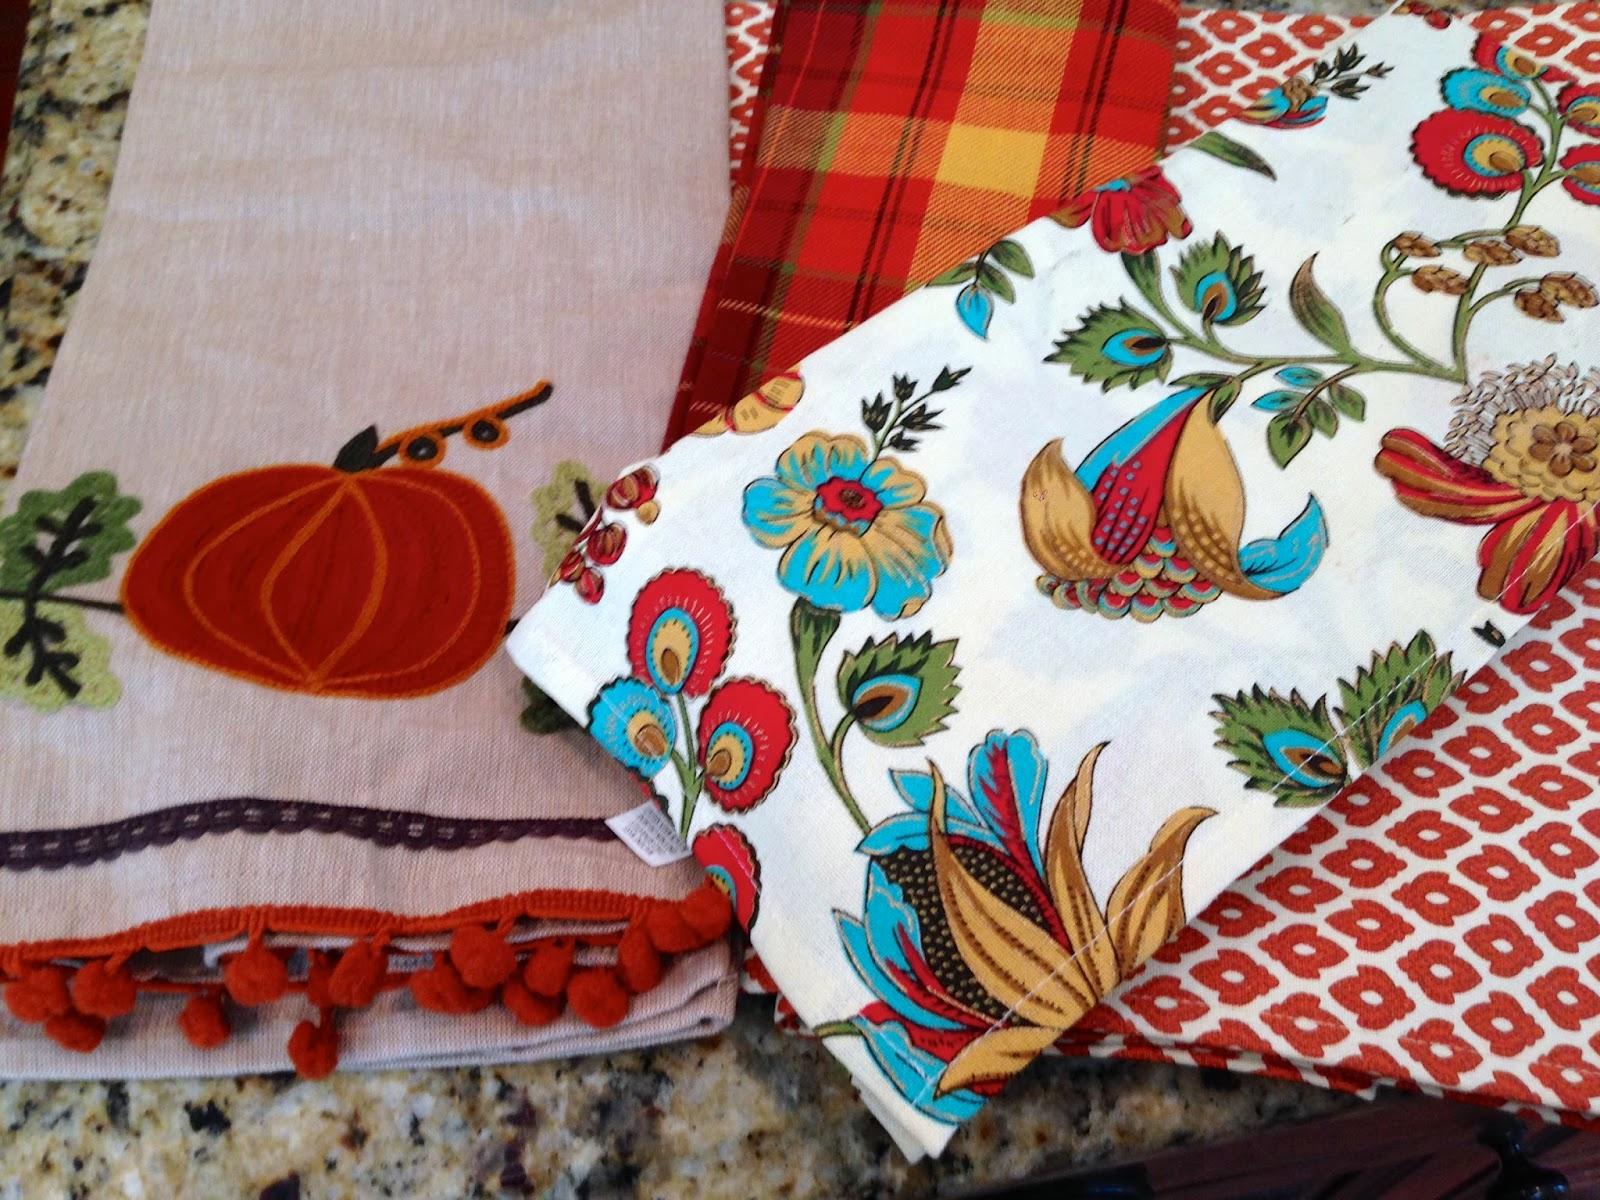 Fall mixed fabrics-www.goldenboysandme.com